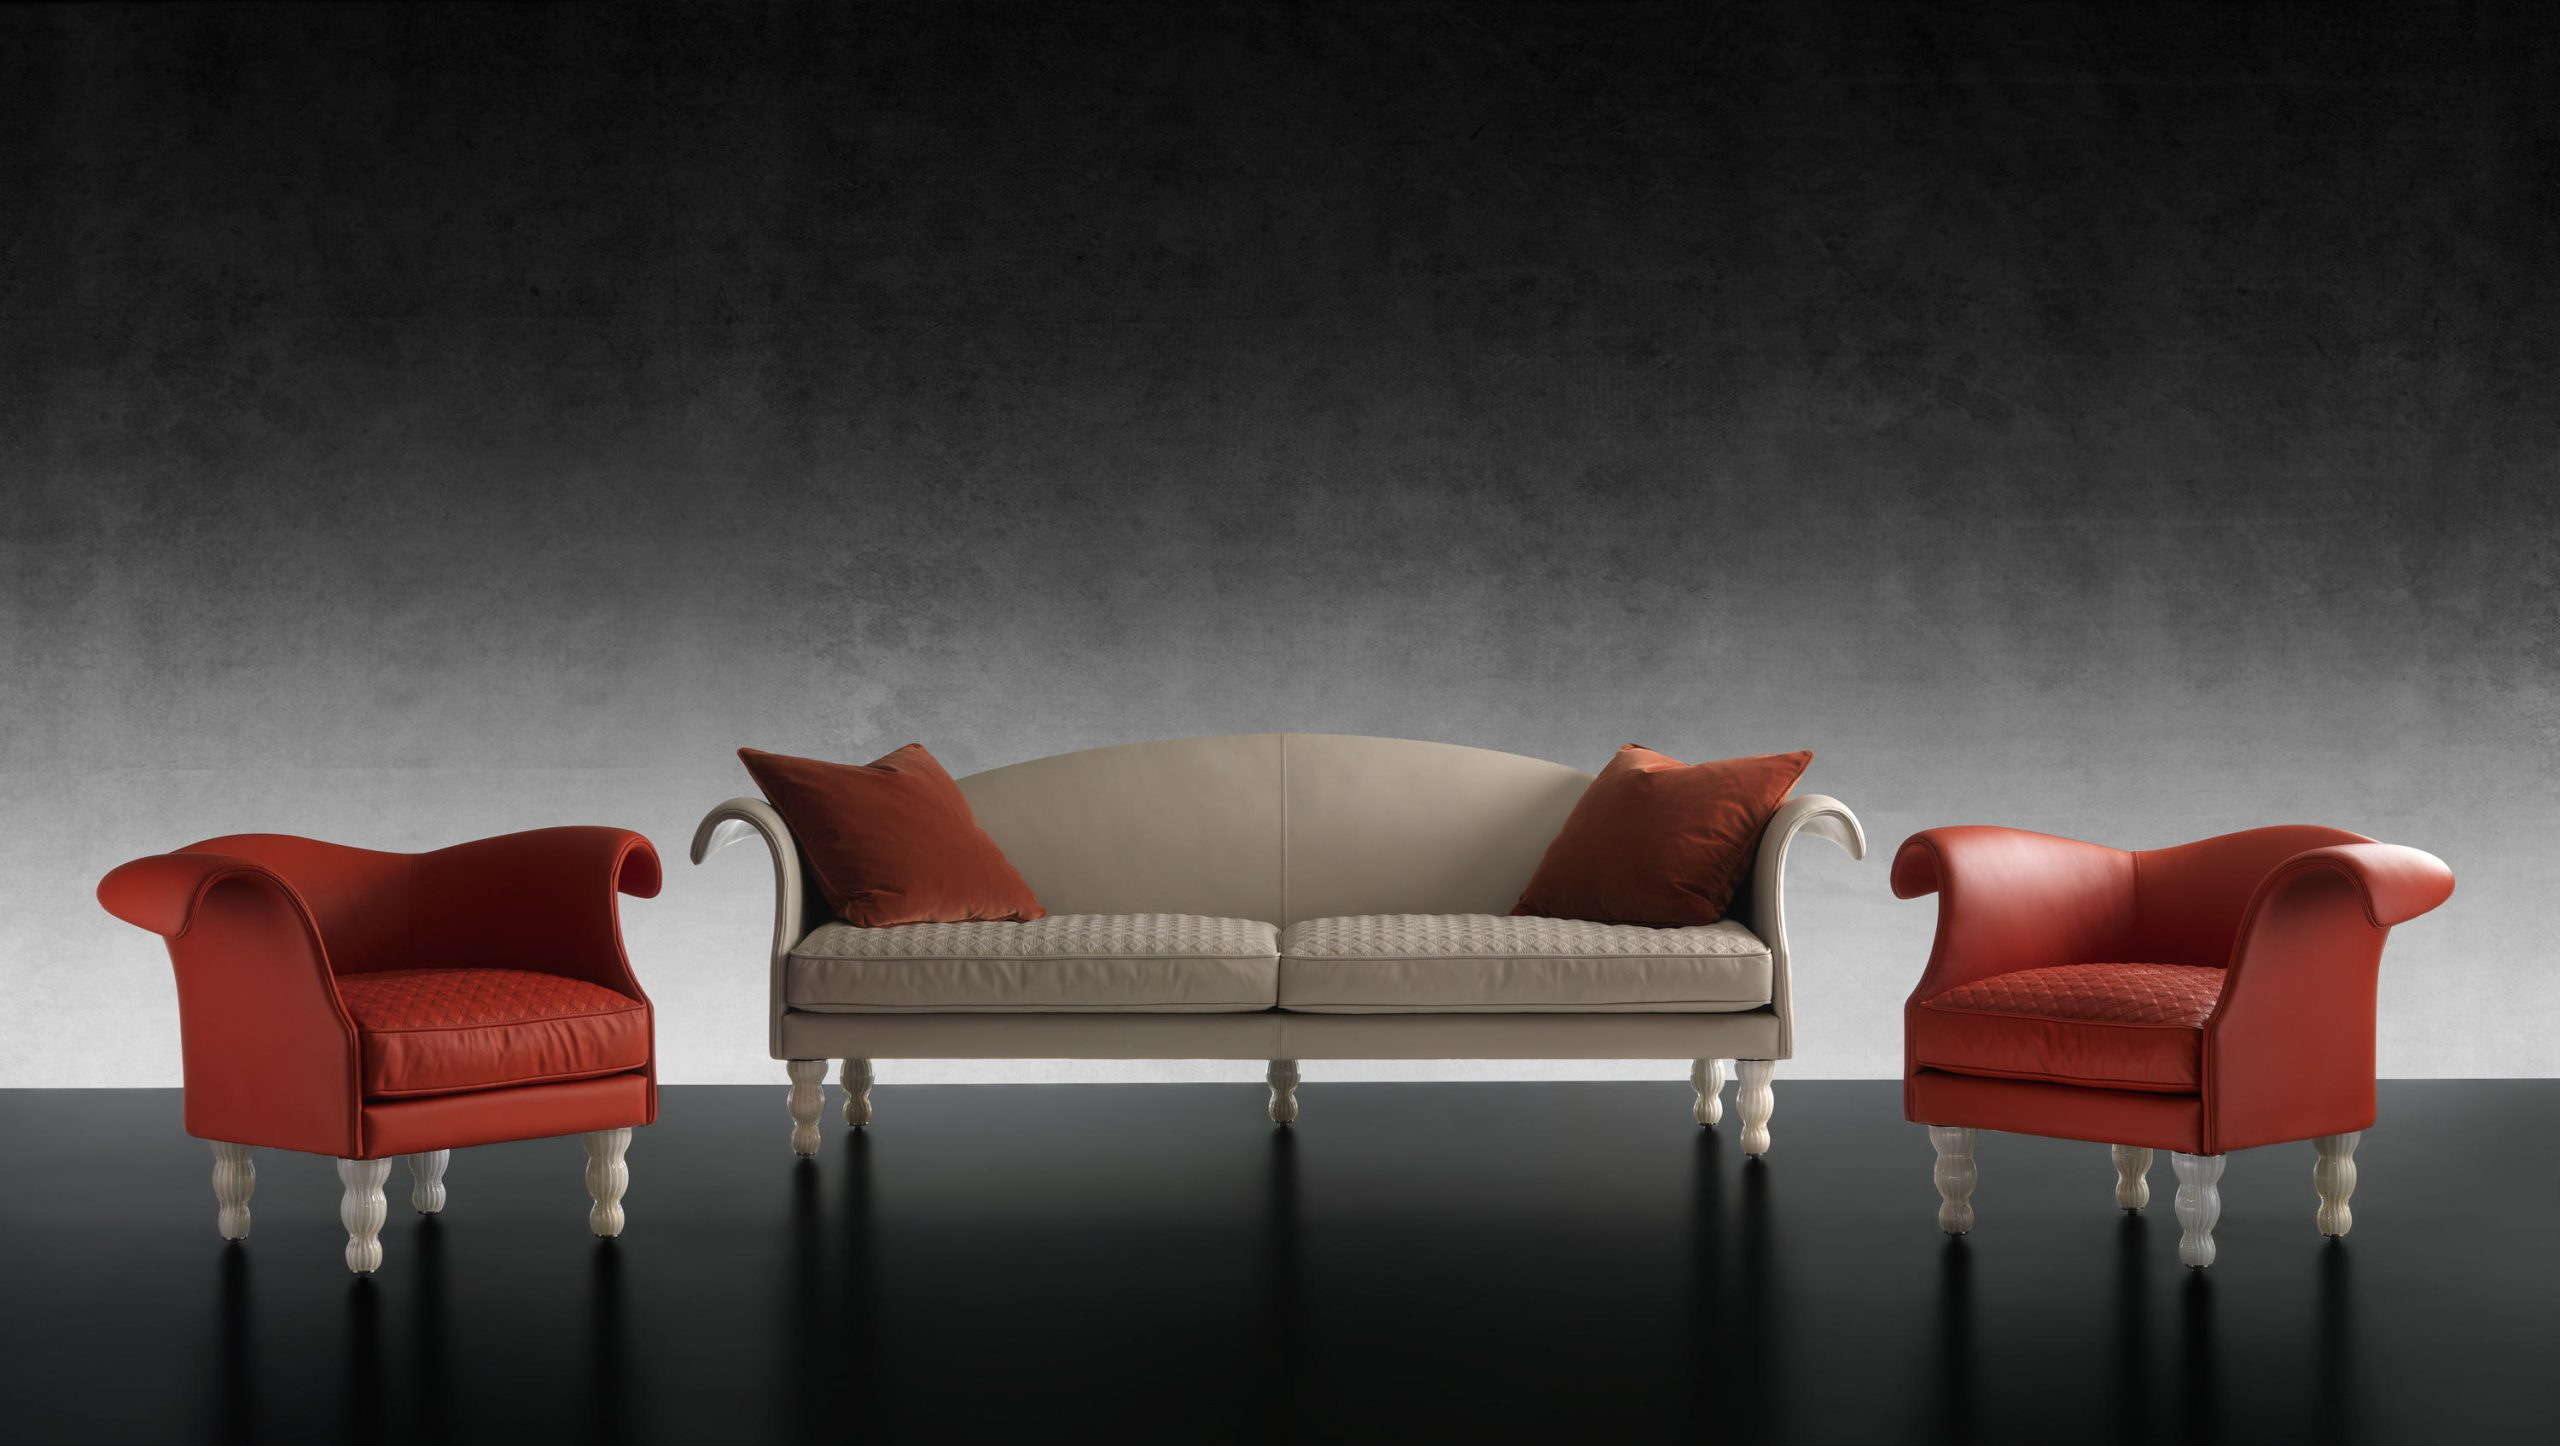 Casanova Fauteuil & Mobilier Design | Architonic à Casanova Canapé Italien